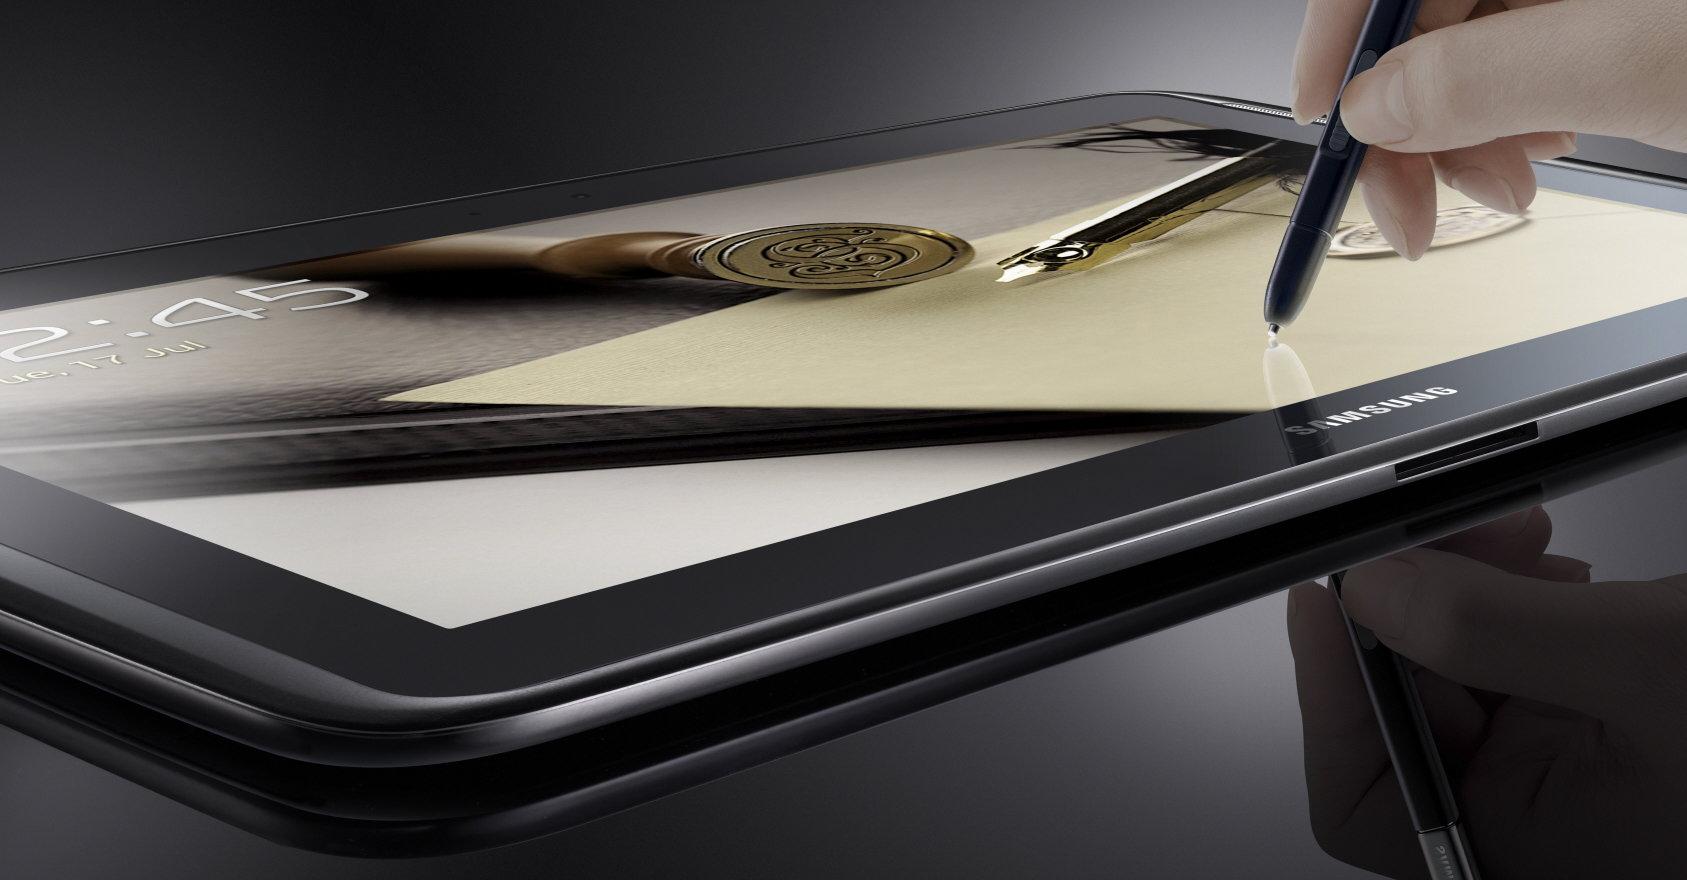 Galaxy Note 10.1 kommer i norske butikker i uke 34, og får en veiledende pris på 5500 kroner.